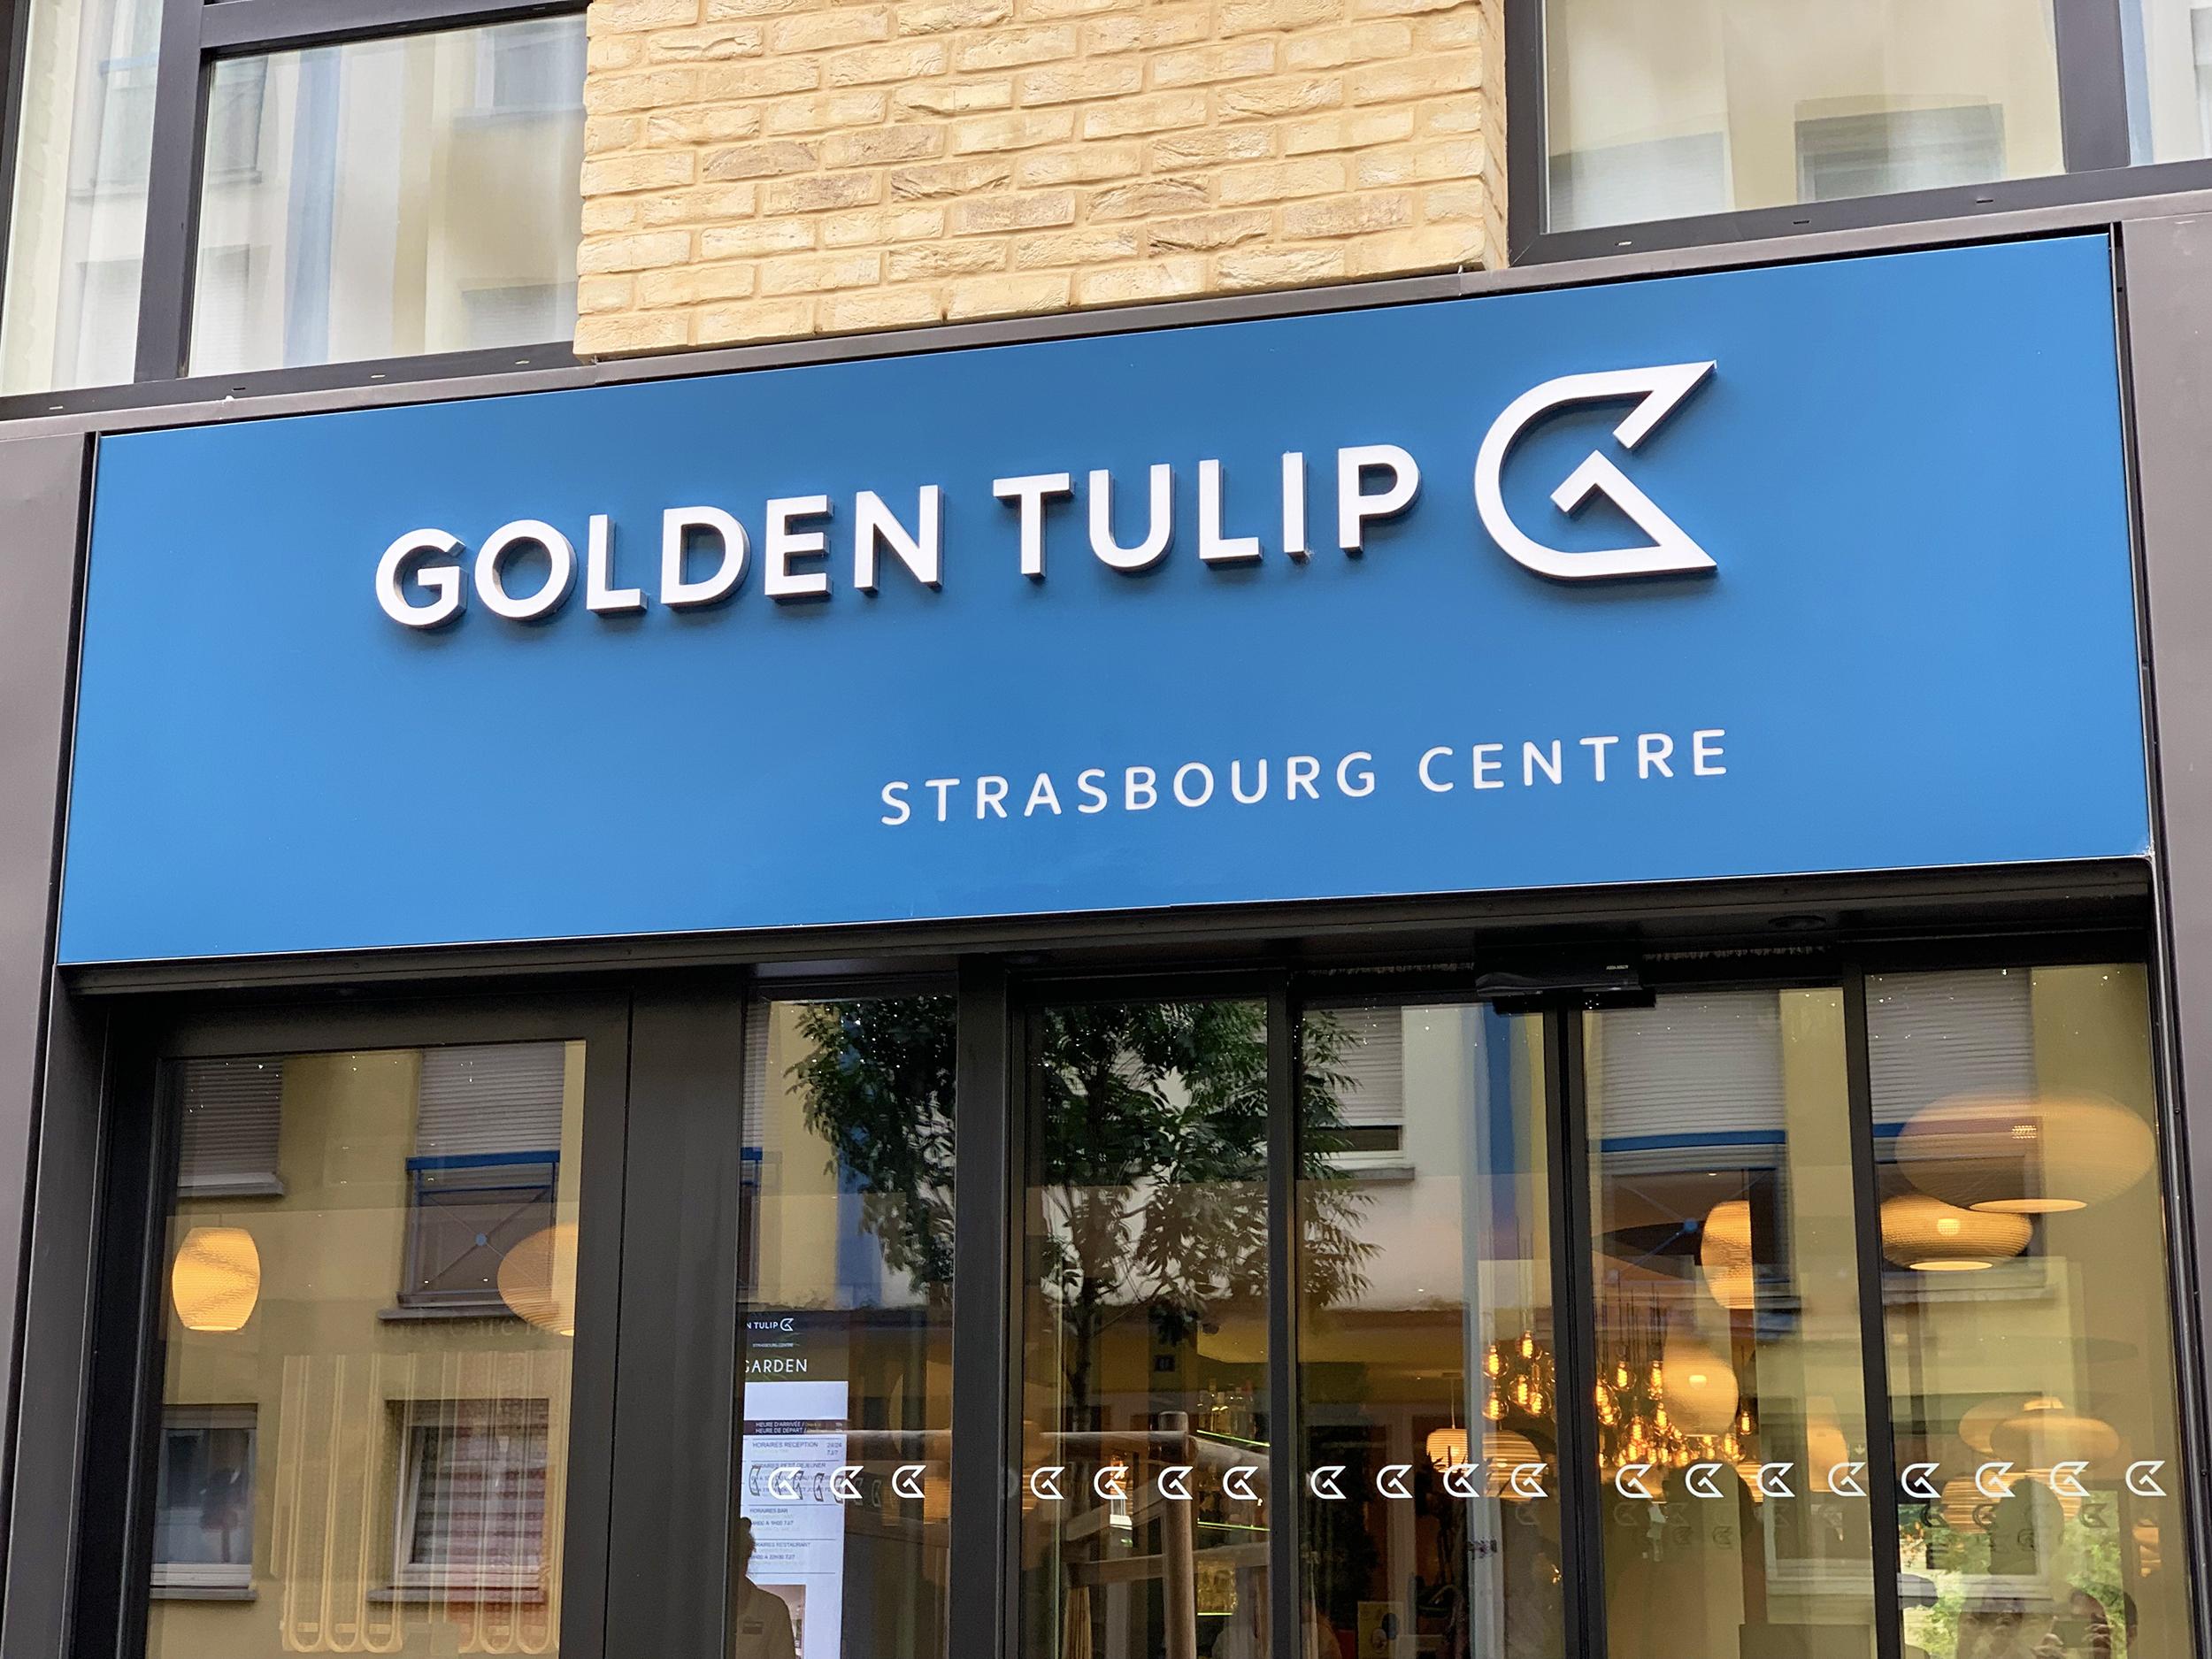 Mon Avis Sur L Hotel Golden Tulip Centre The Garden A Strasbourg